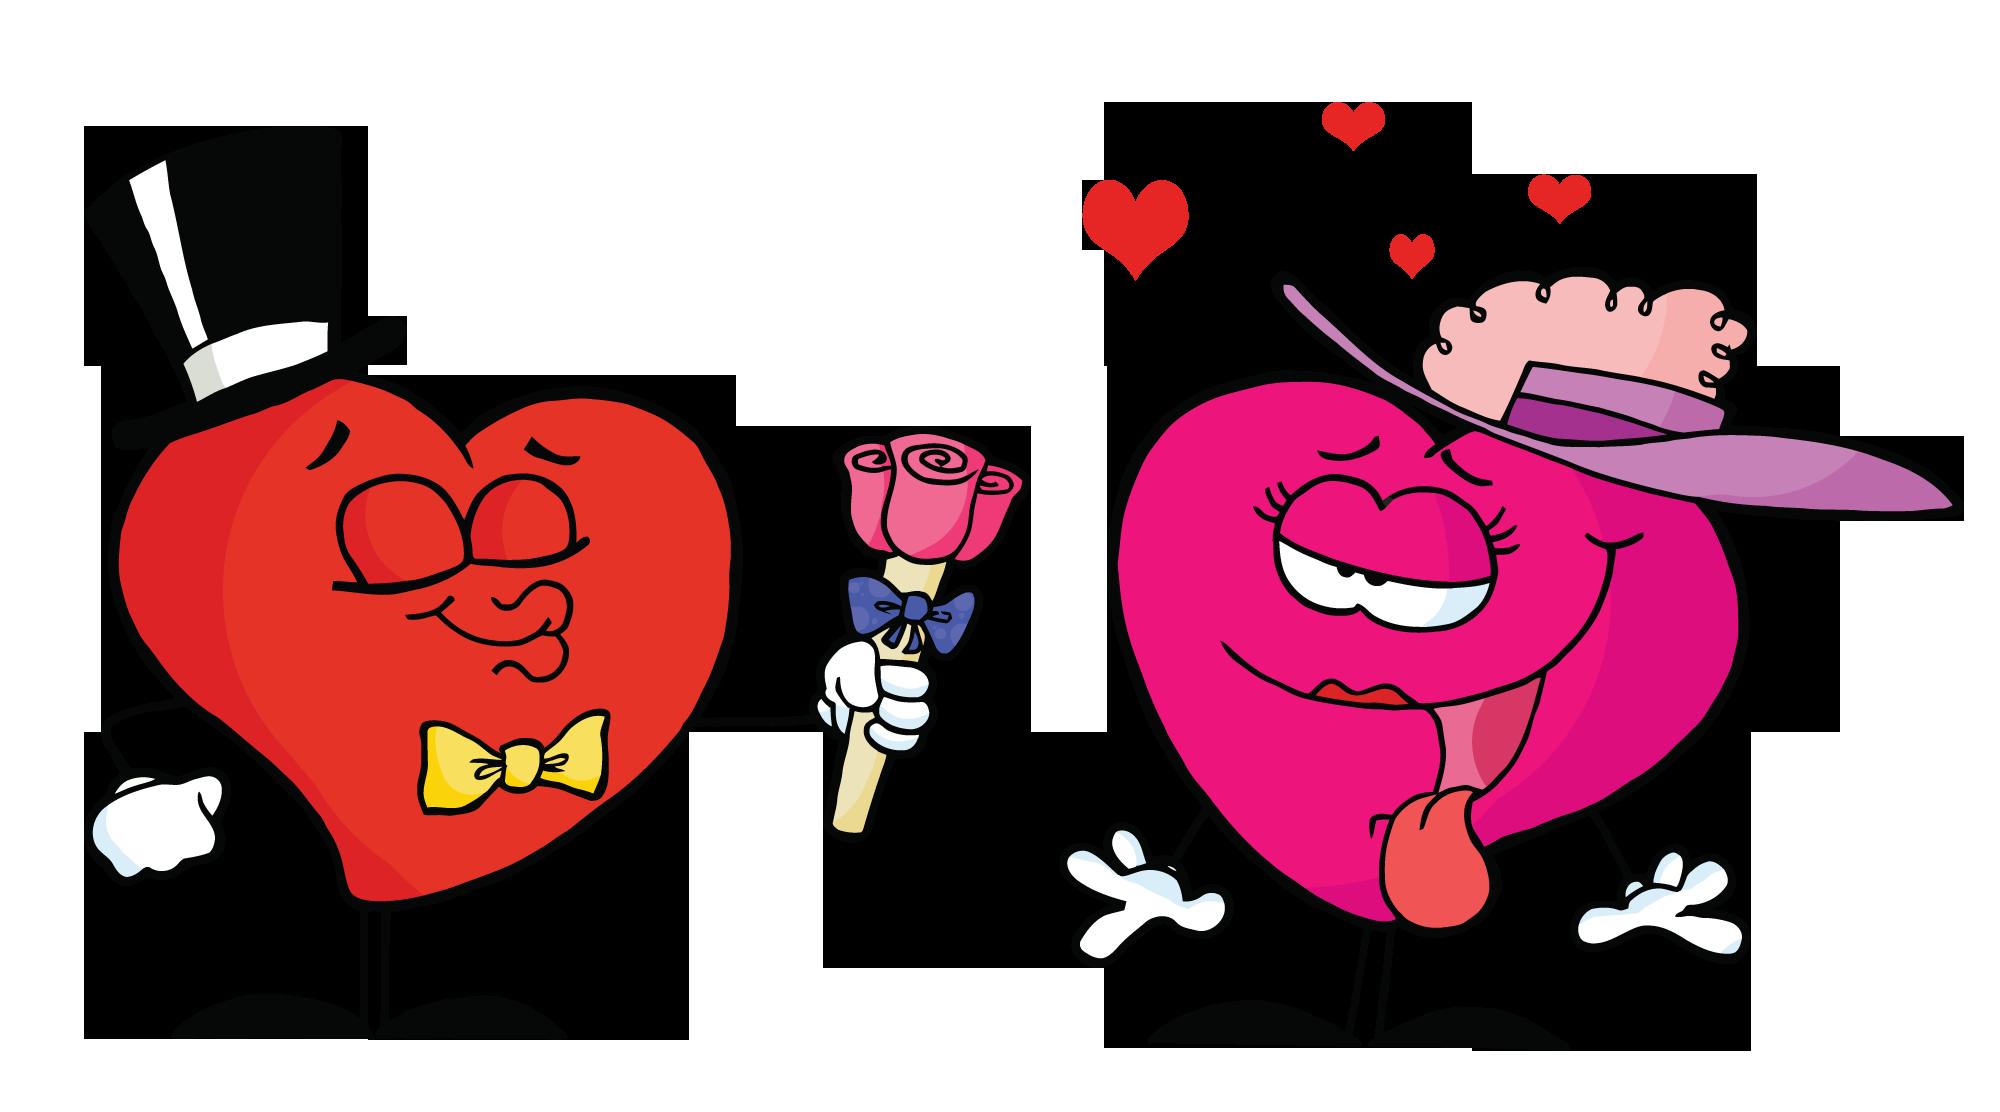 Pix For u0026gt; Romantic Date Clipart-Pix For u0026gt; Romantic Date Clipart-8